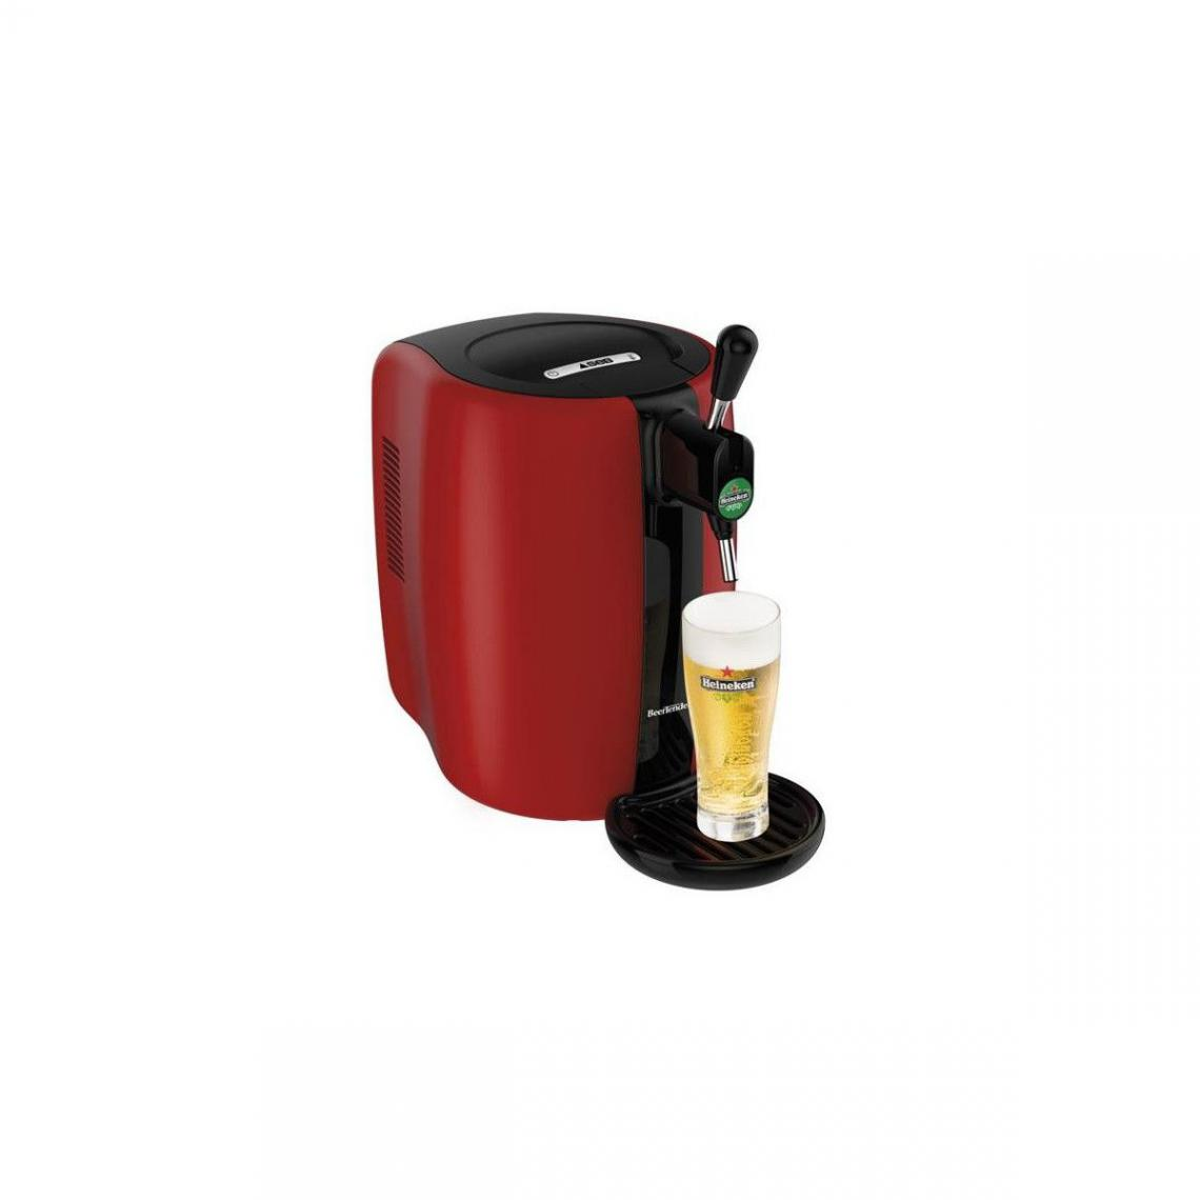 Seb Machine A Biere Beertender 5l 6varietes De Biere Rouge Seb - Vb310510